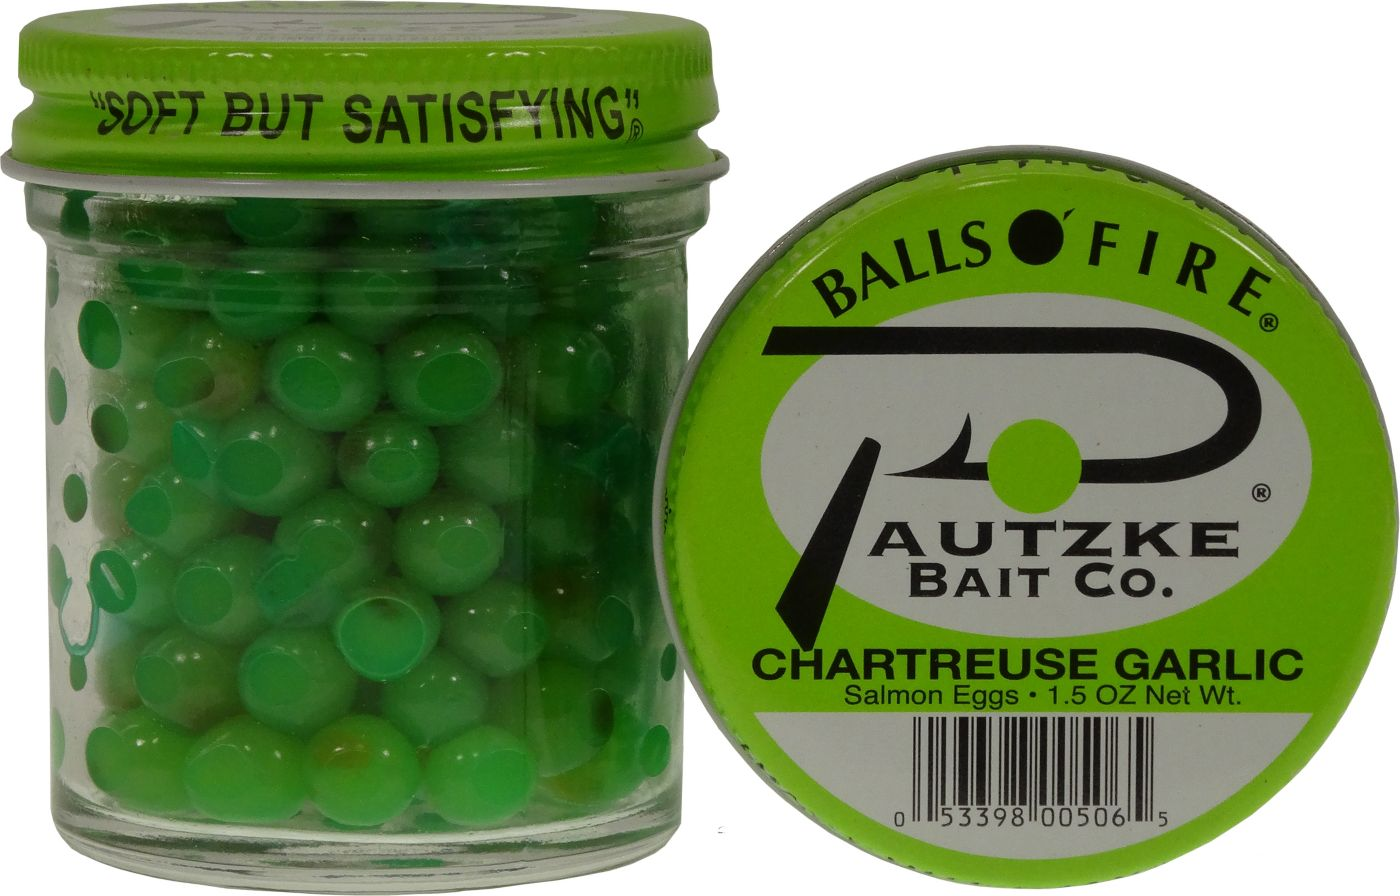 Pautzke Balls O' Fire Chartreuse Garlic Salmon Eggs